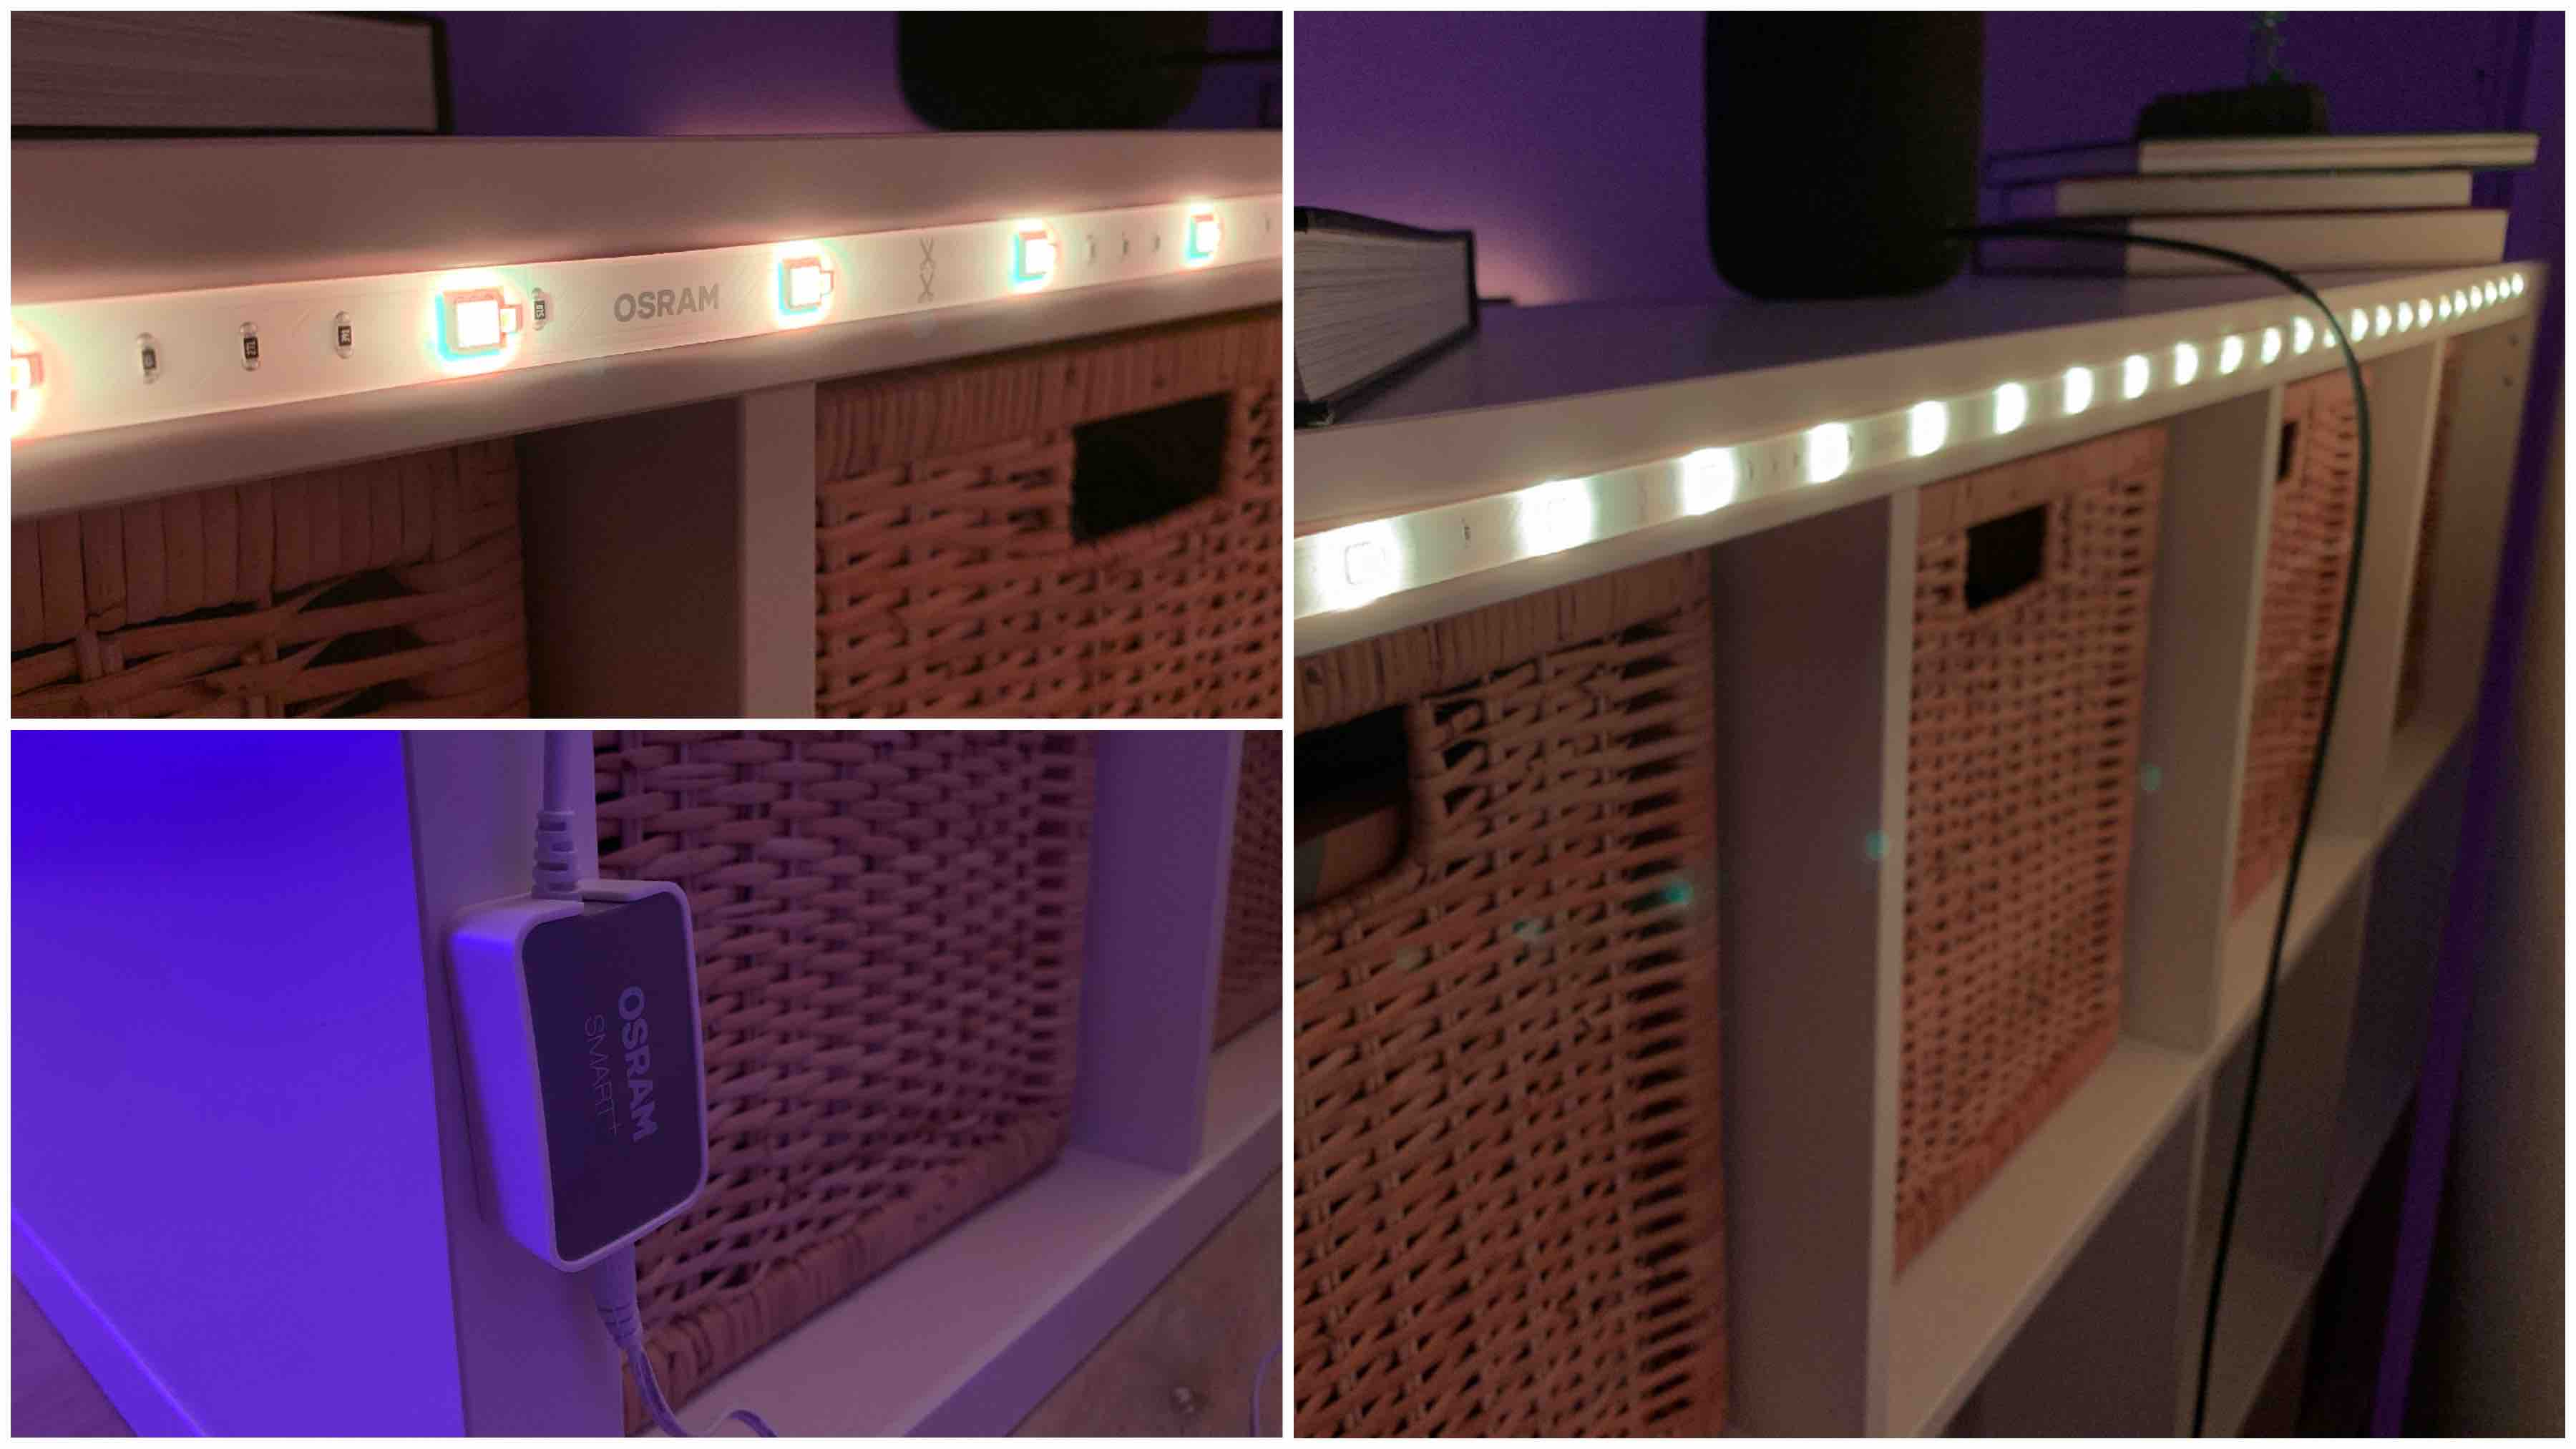 Osram_Smart_LED_Streifen_Review_HomeKit1 Osram Smart+ LED-Streifen - Akzente setzen und via HomeKit bedienen